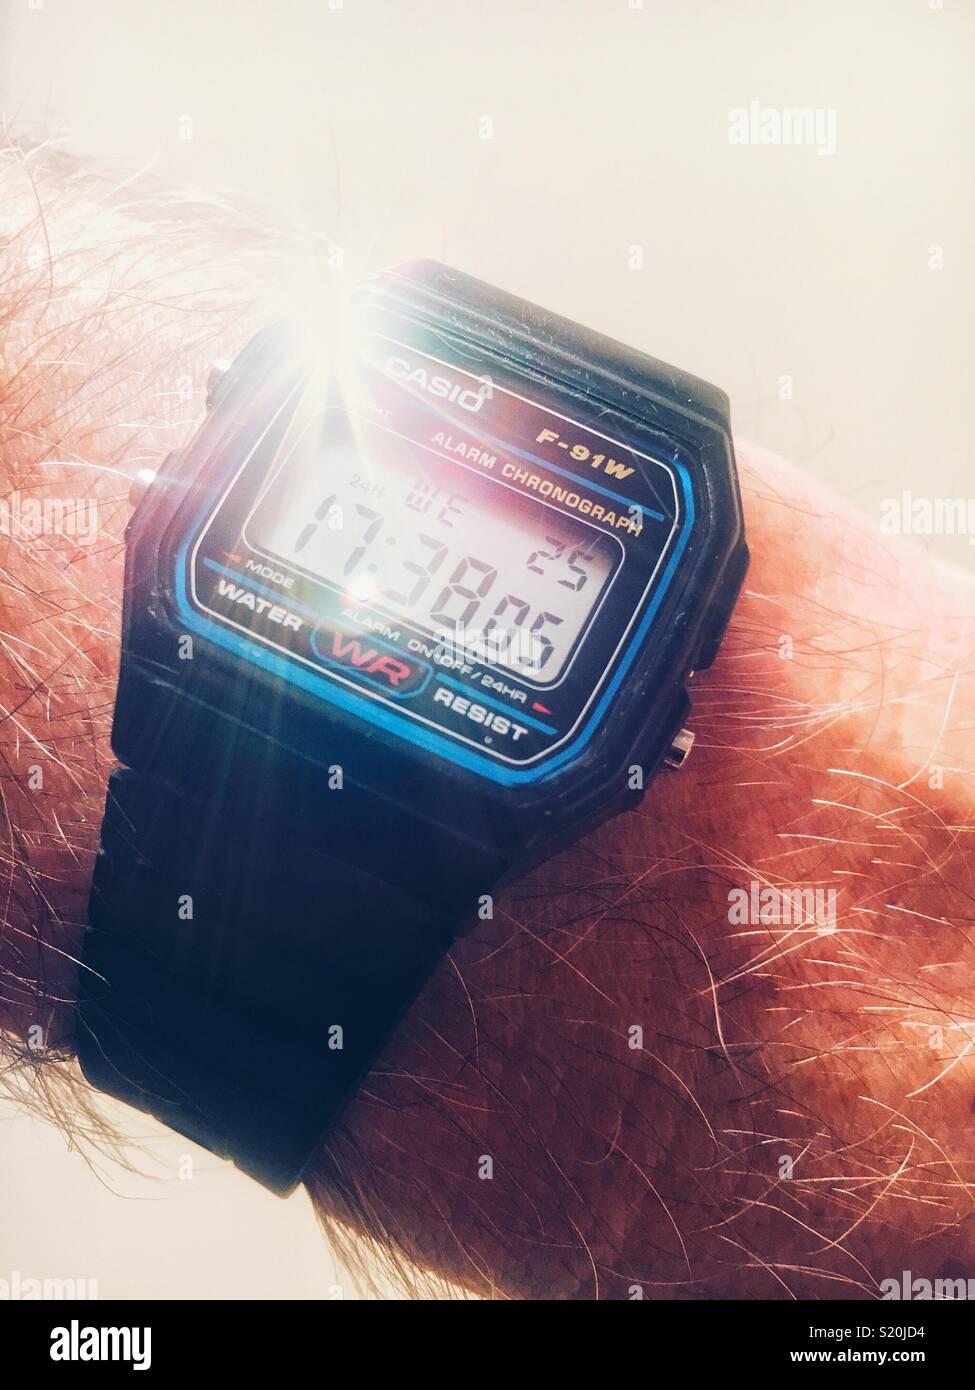 Casio digital watch - Stock Image